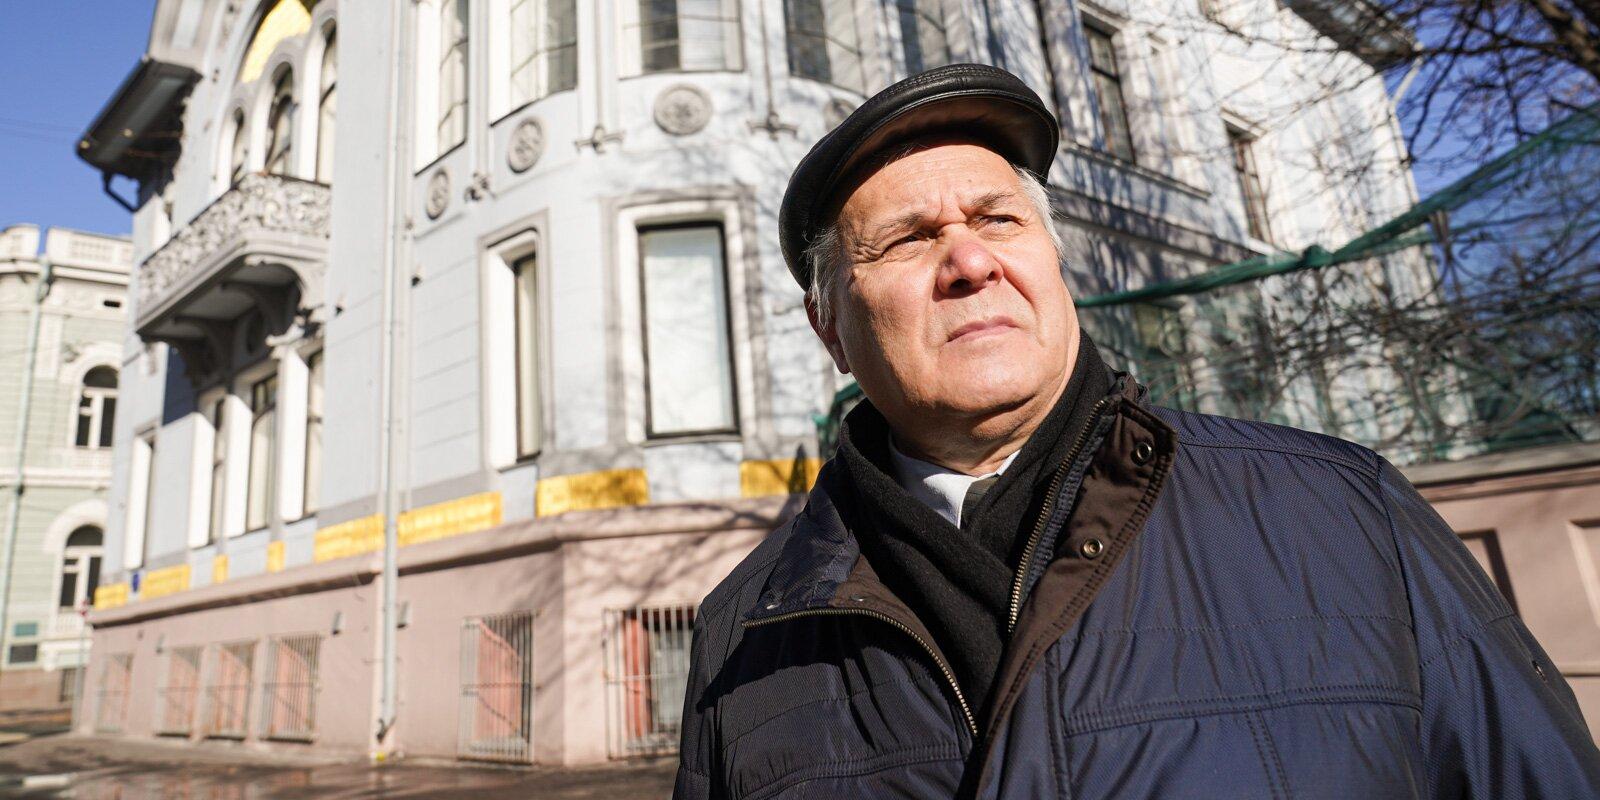 Boris Moginov. Photo by Yevgeny Samarin, Mos.ru